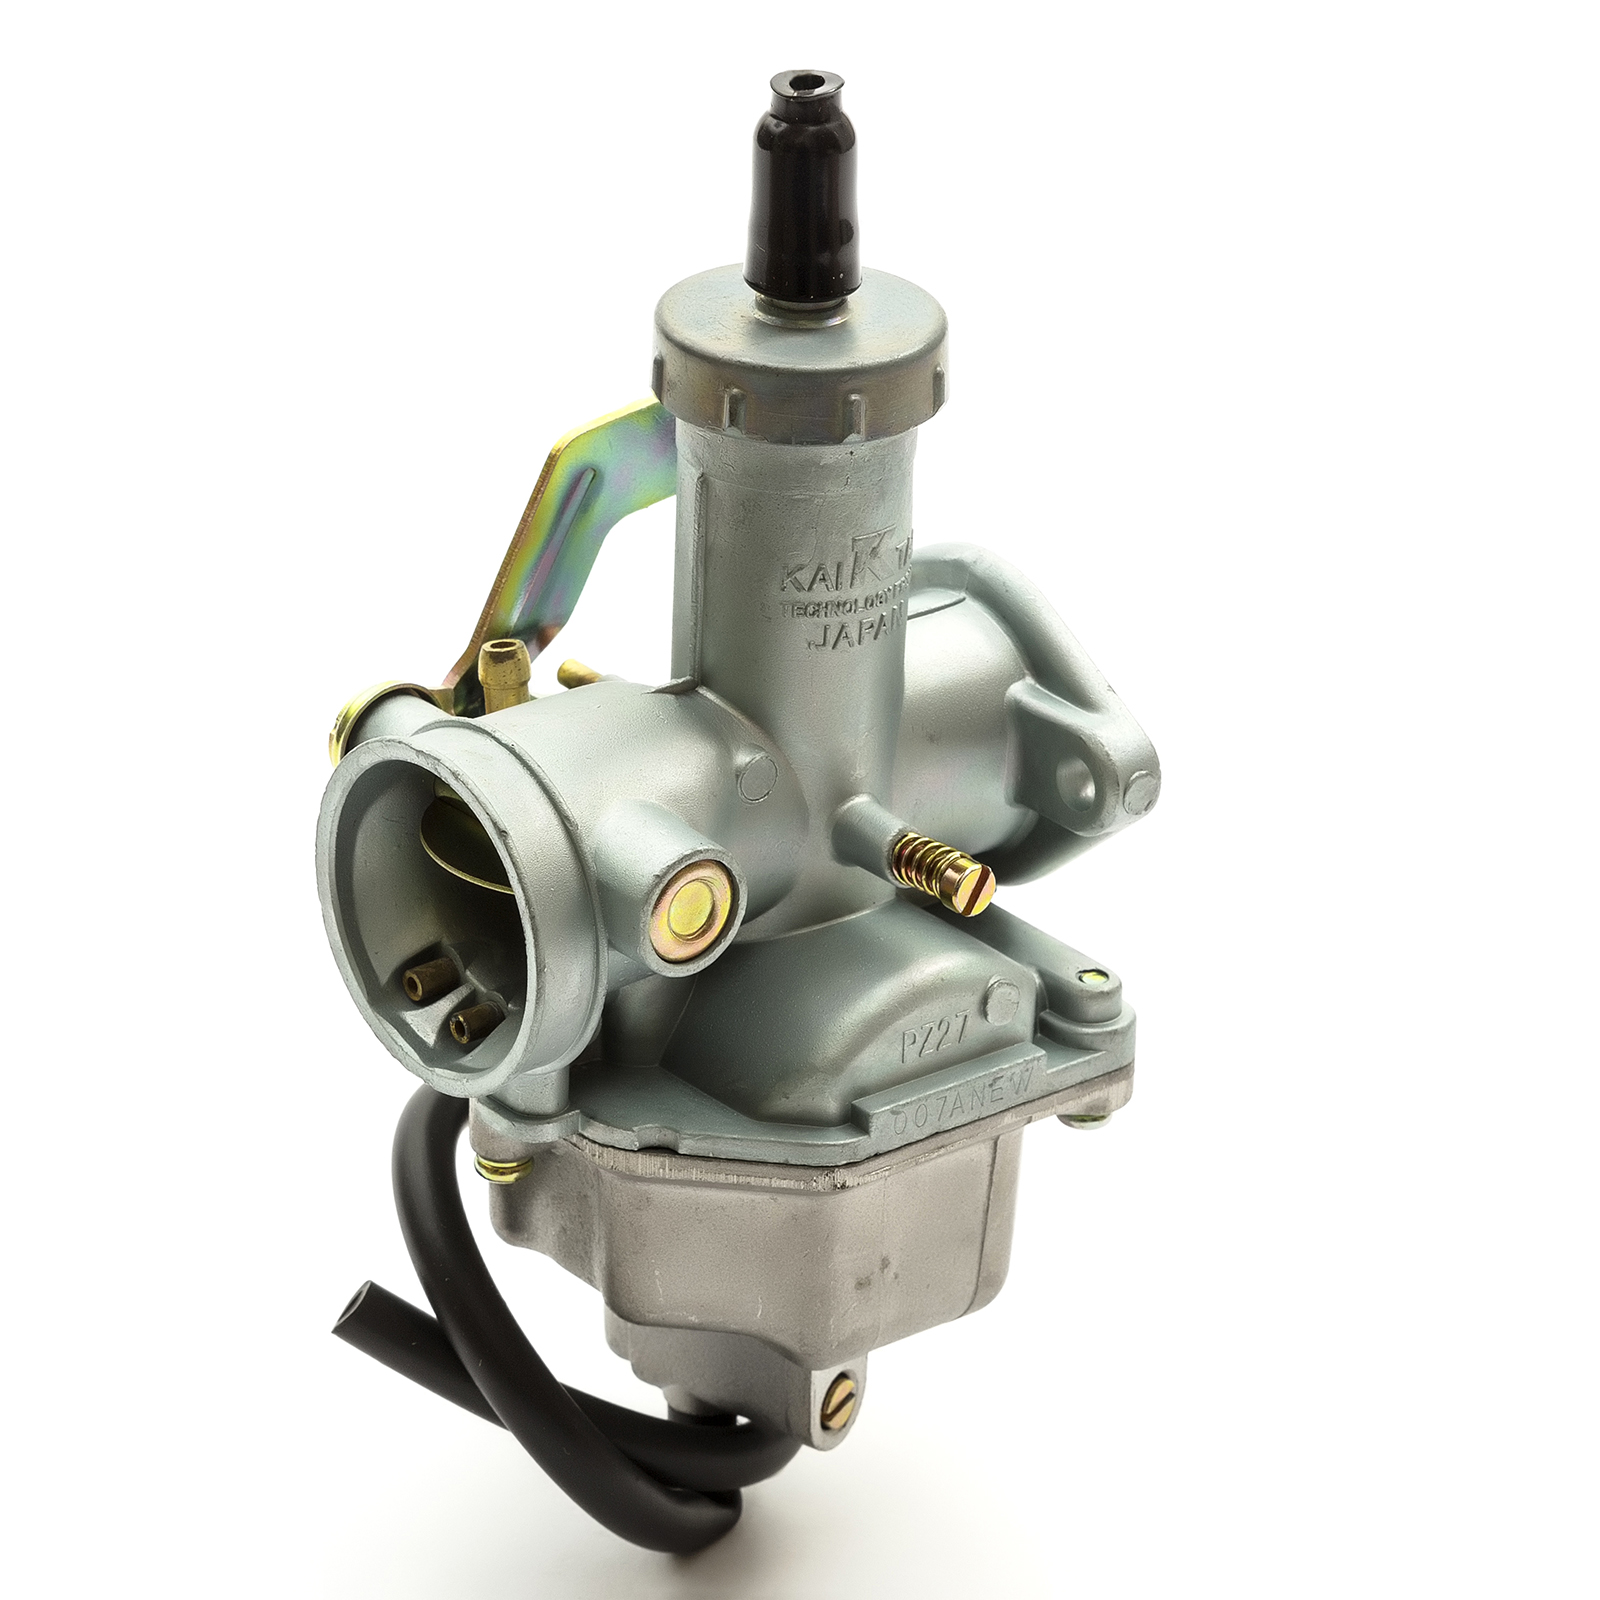 Details about PZ27 27mm Kaikta Carburettor Carb Cable Choke Motor Bike  Honda XR CB XL CRF Pit